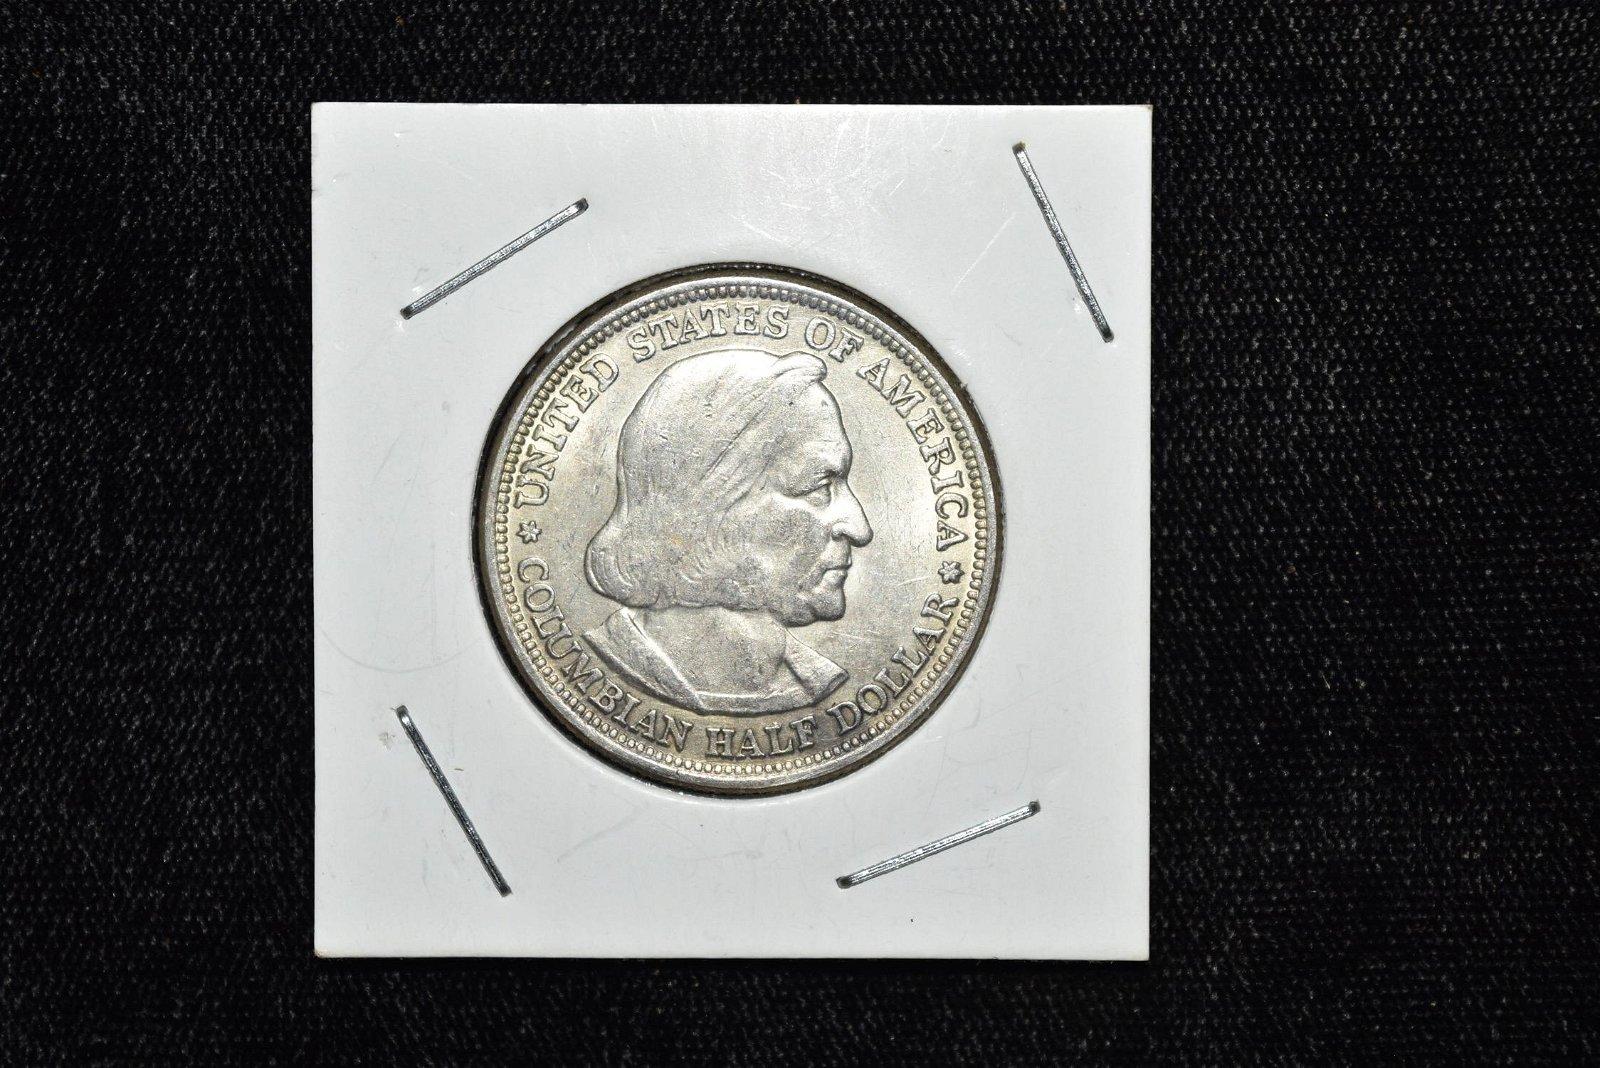 1893 Columbian 1/2 Dollar, Silver